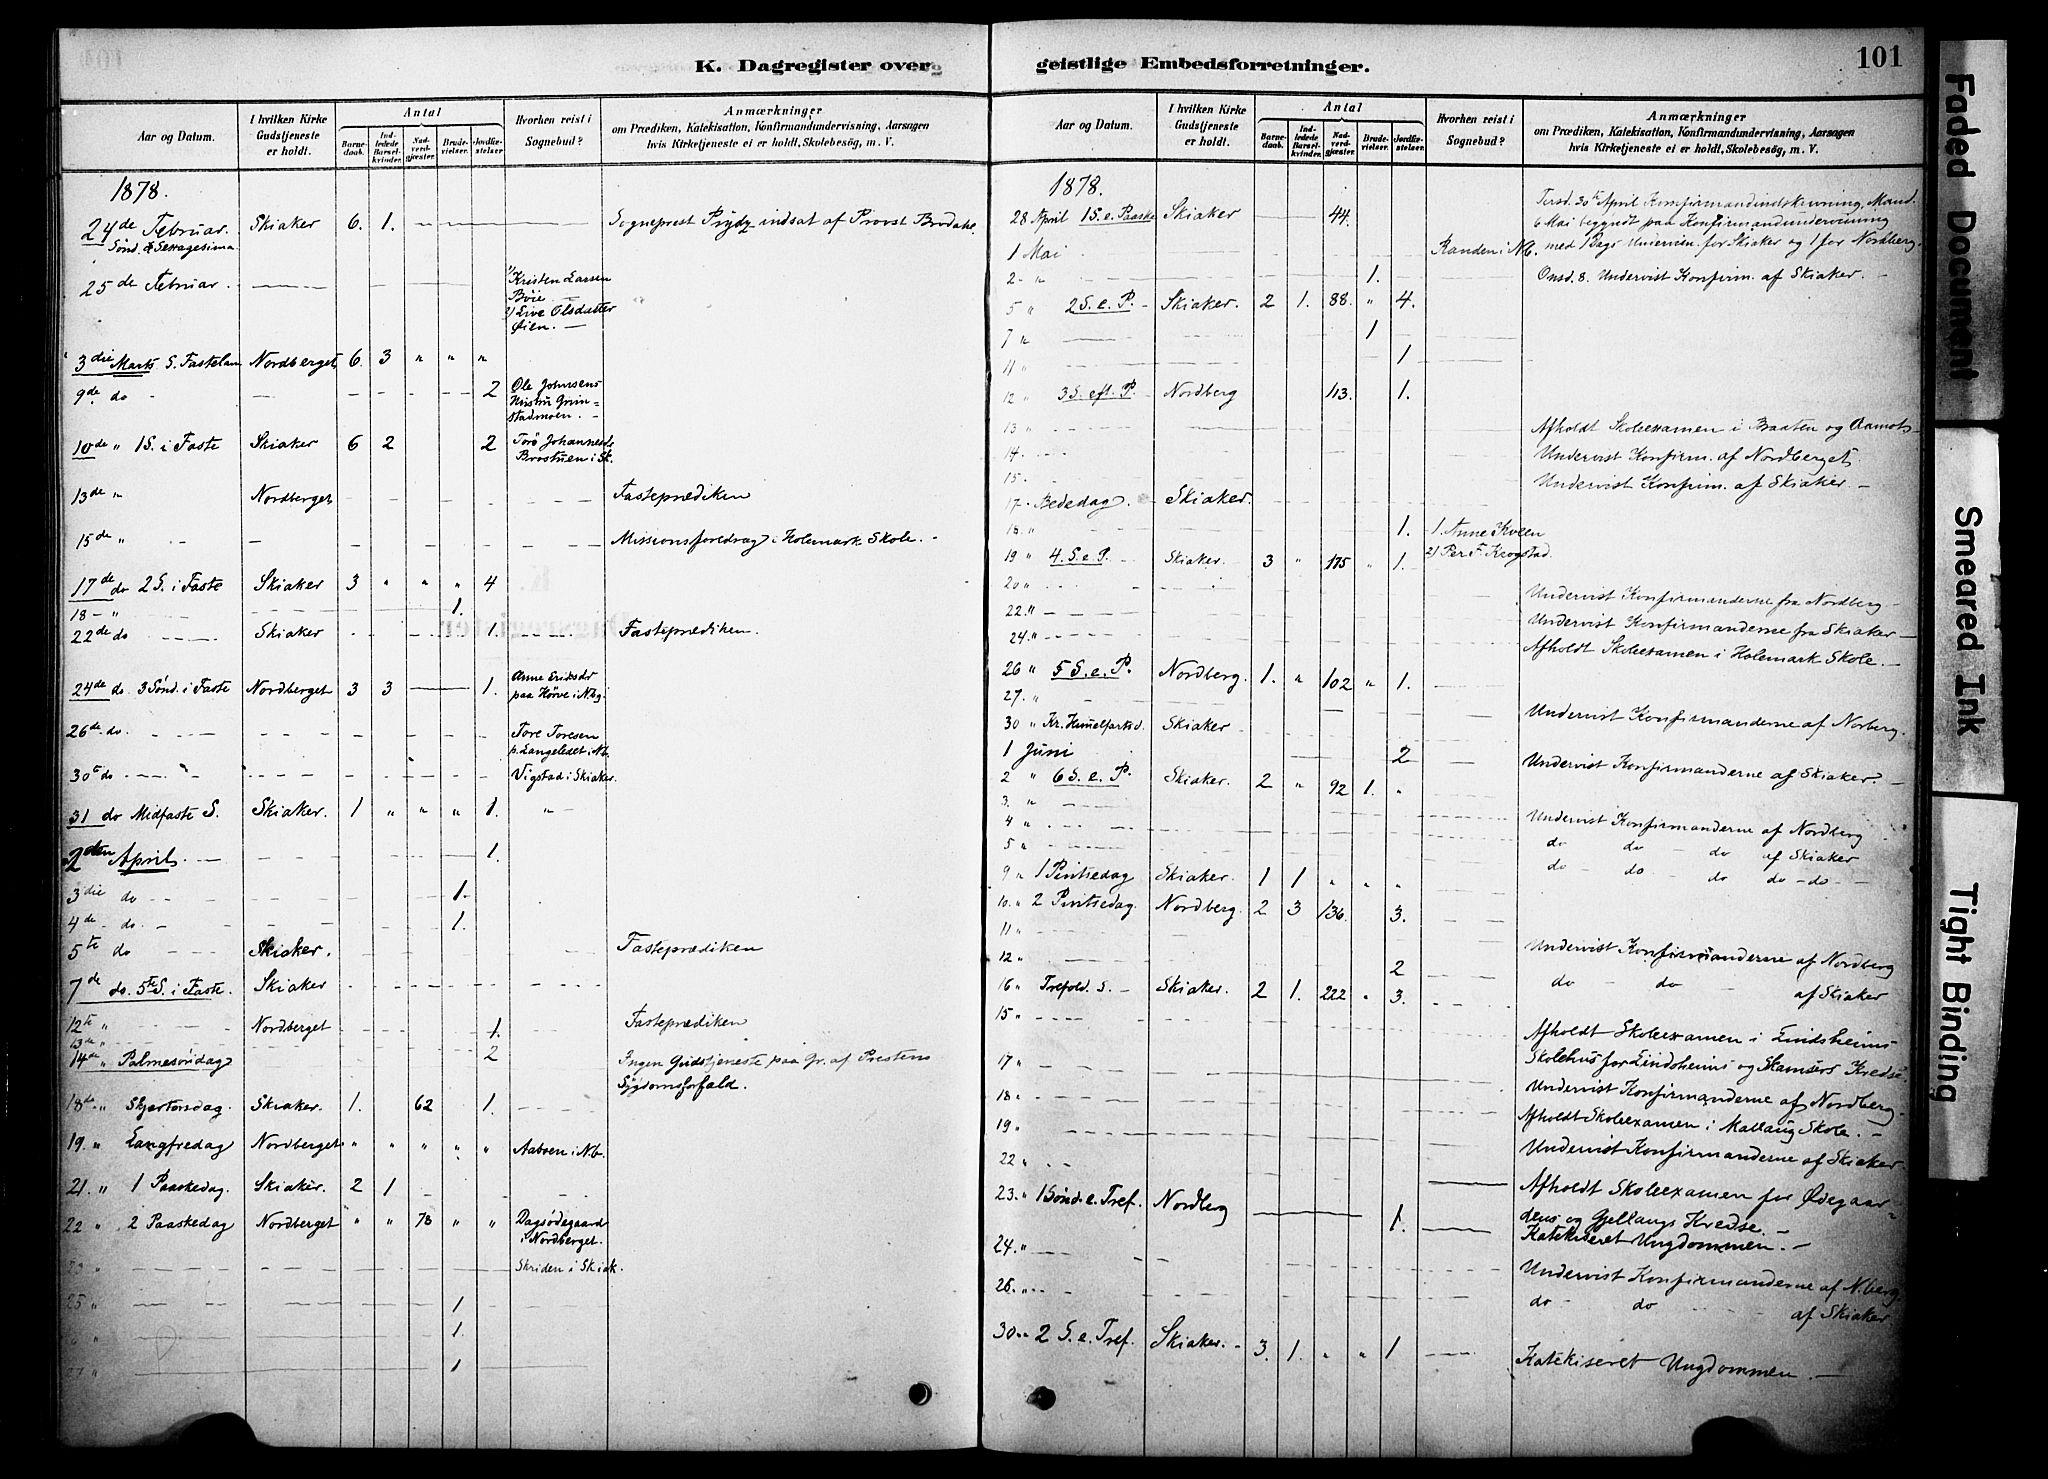 SAH, Skjåk prestekontor, Ministerialbok nr. 2, 1878-1907, s. 101